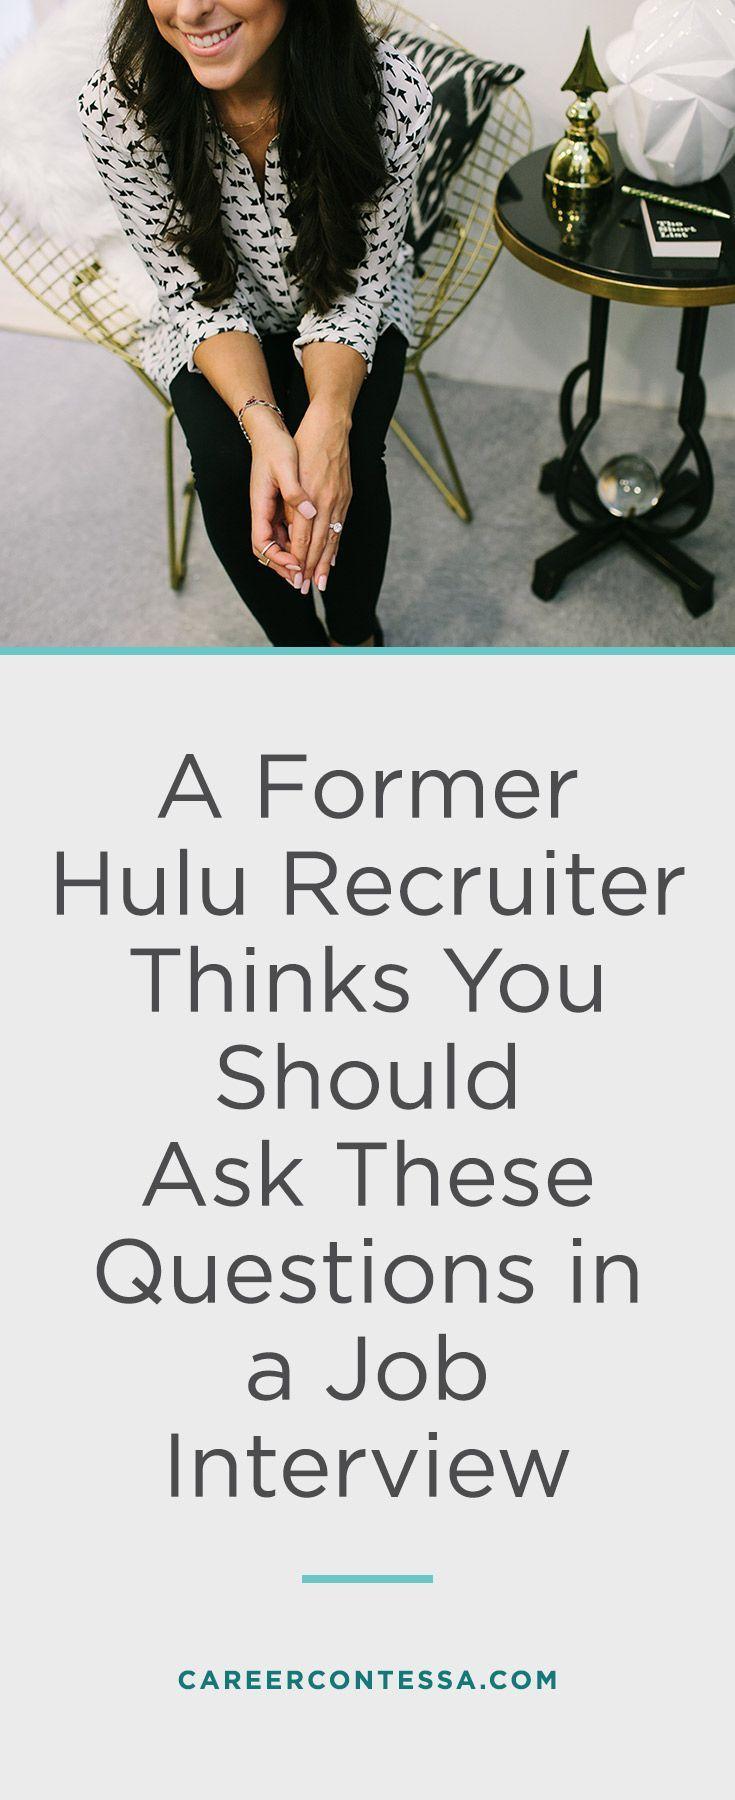 35 questions postdoc candidates should ask during postdoctoral job